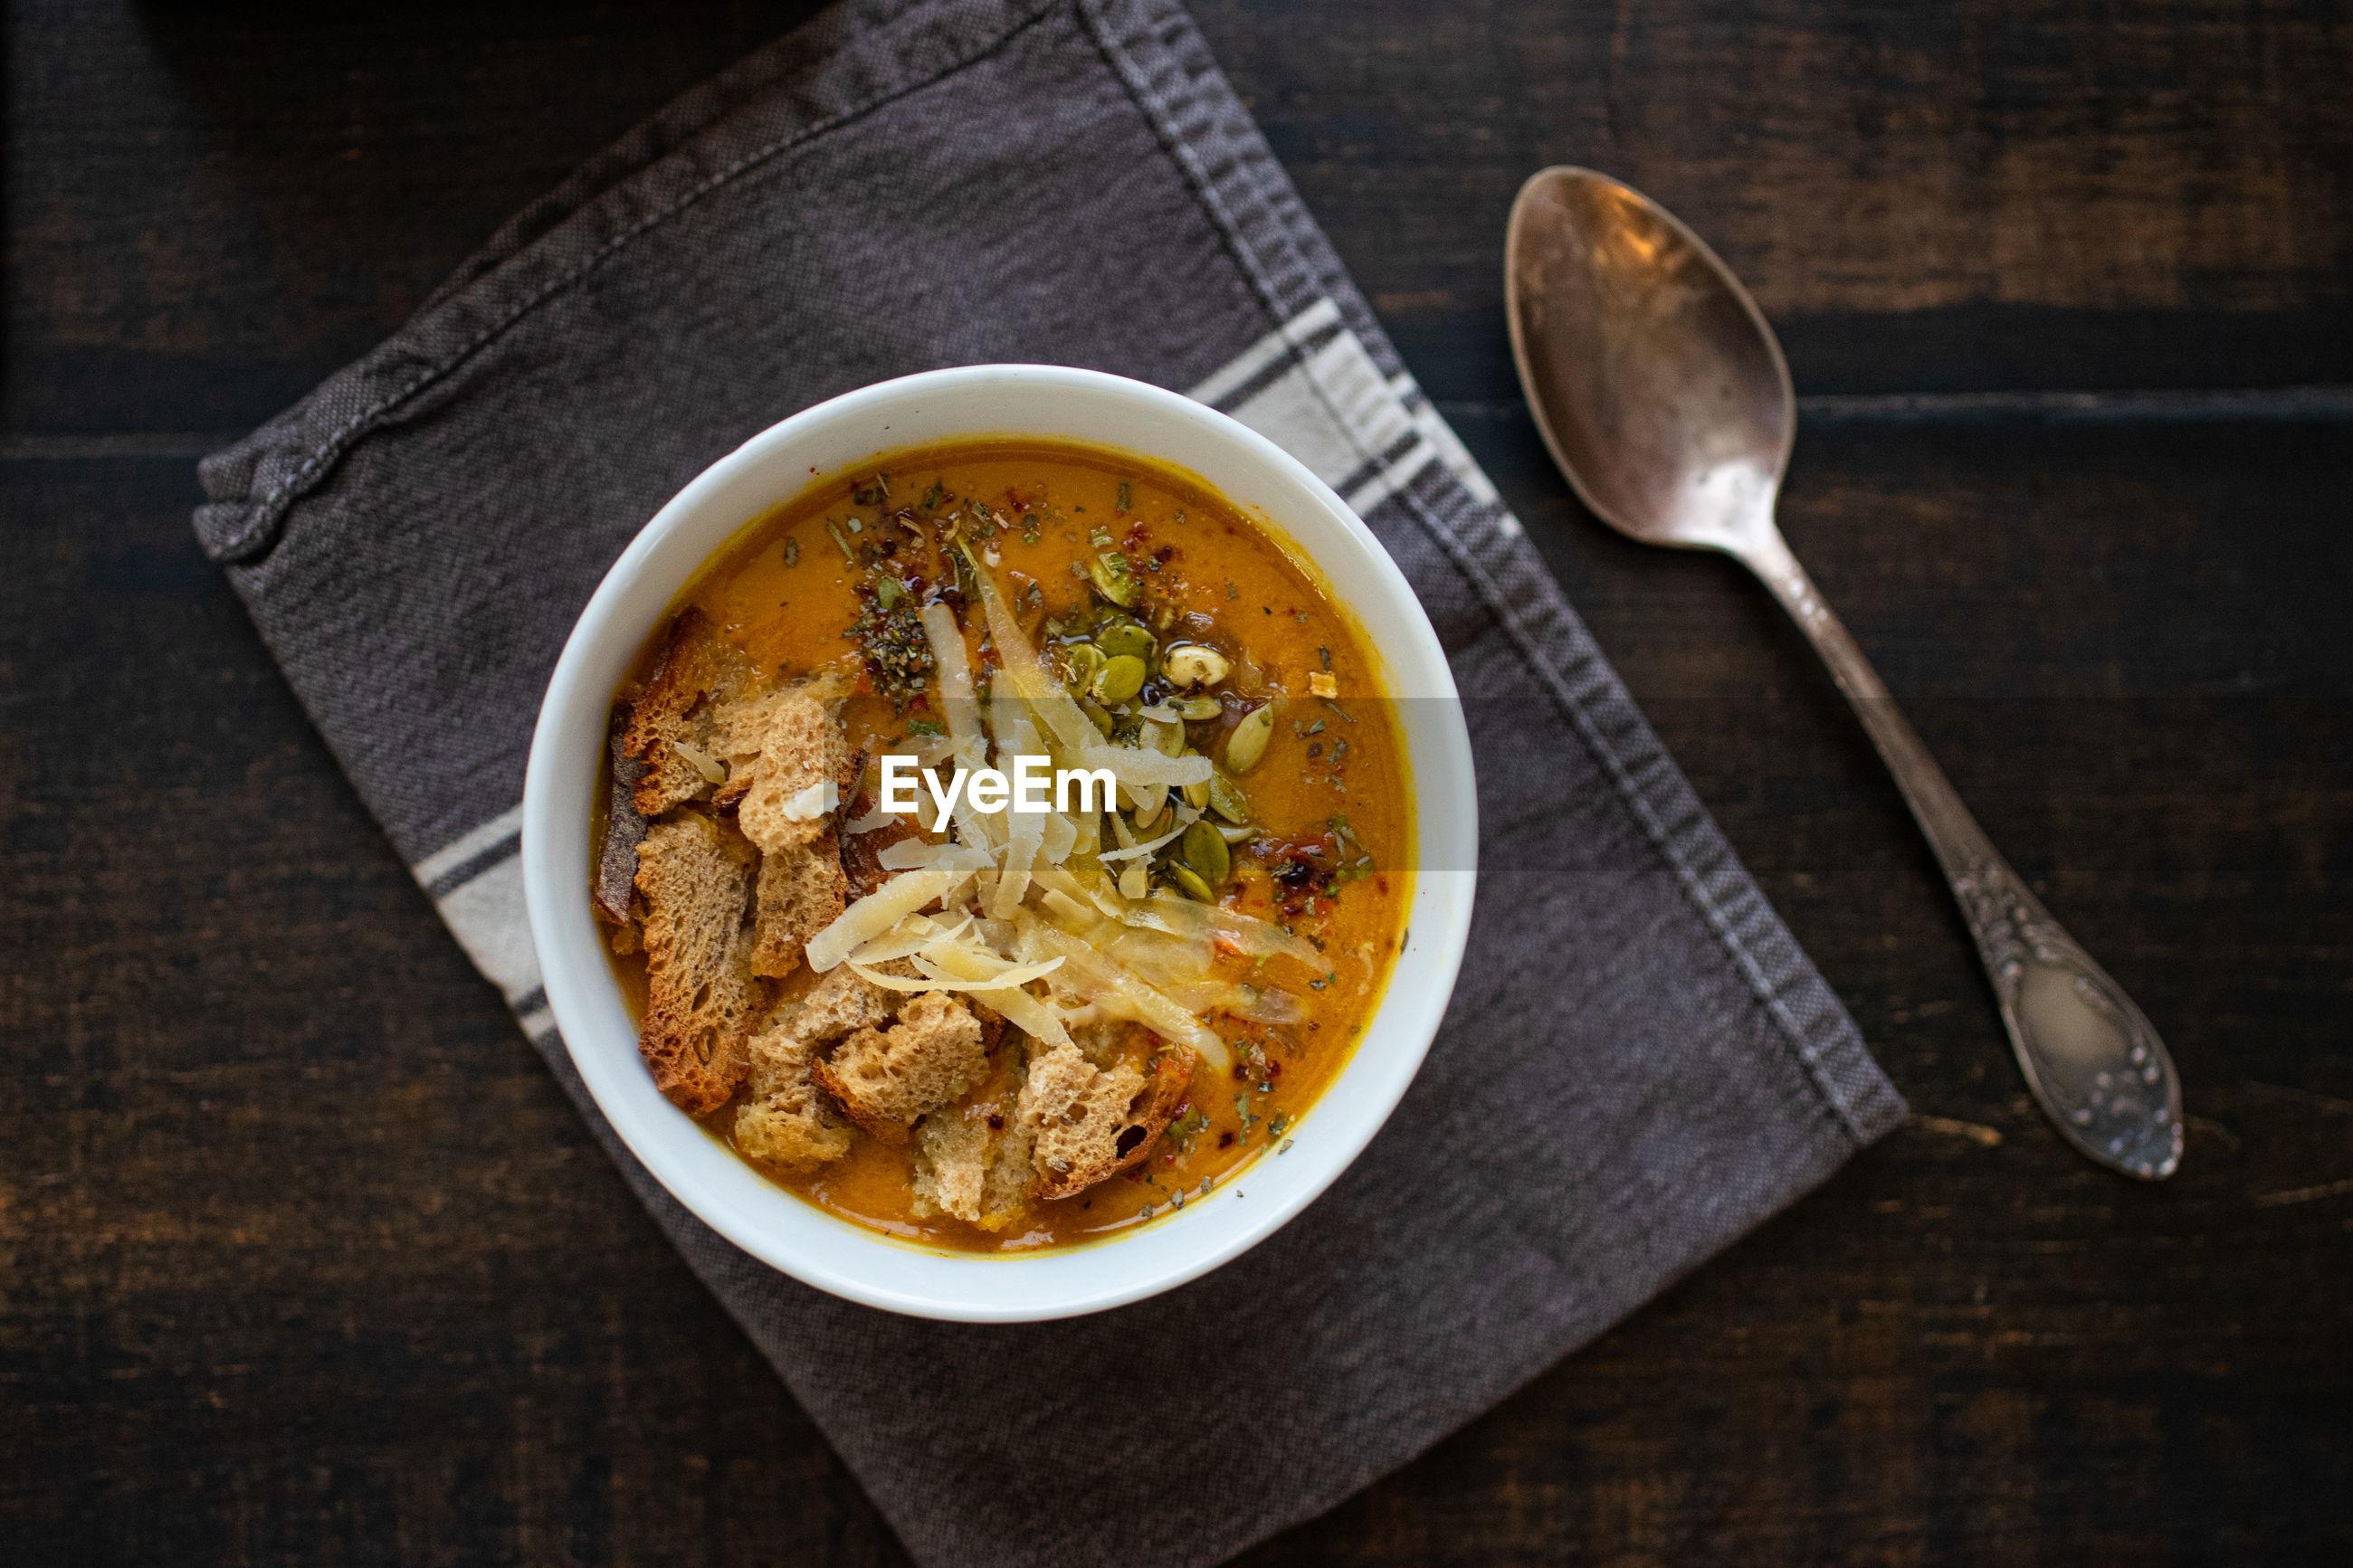 HIGH ANGLE VIEW OF SOUP ON TABLE